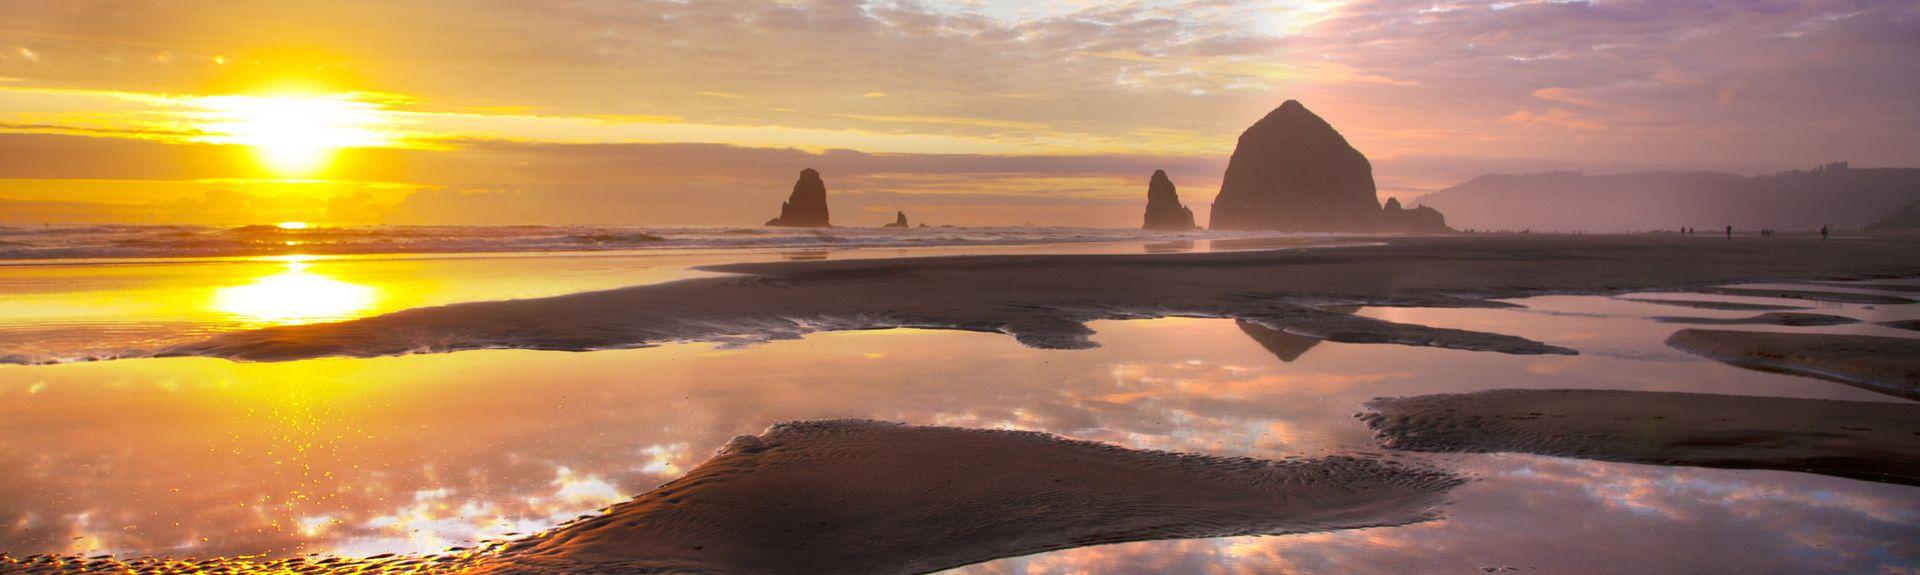 Cannon Beach, Cannon Beach, Oregon, Vereinigte Staaten